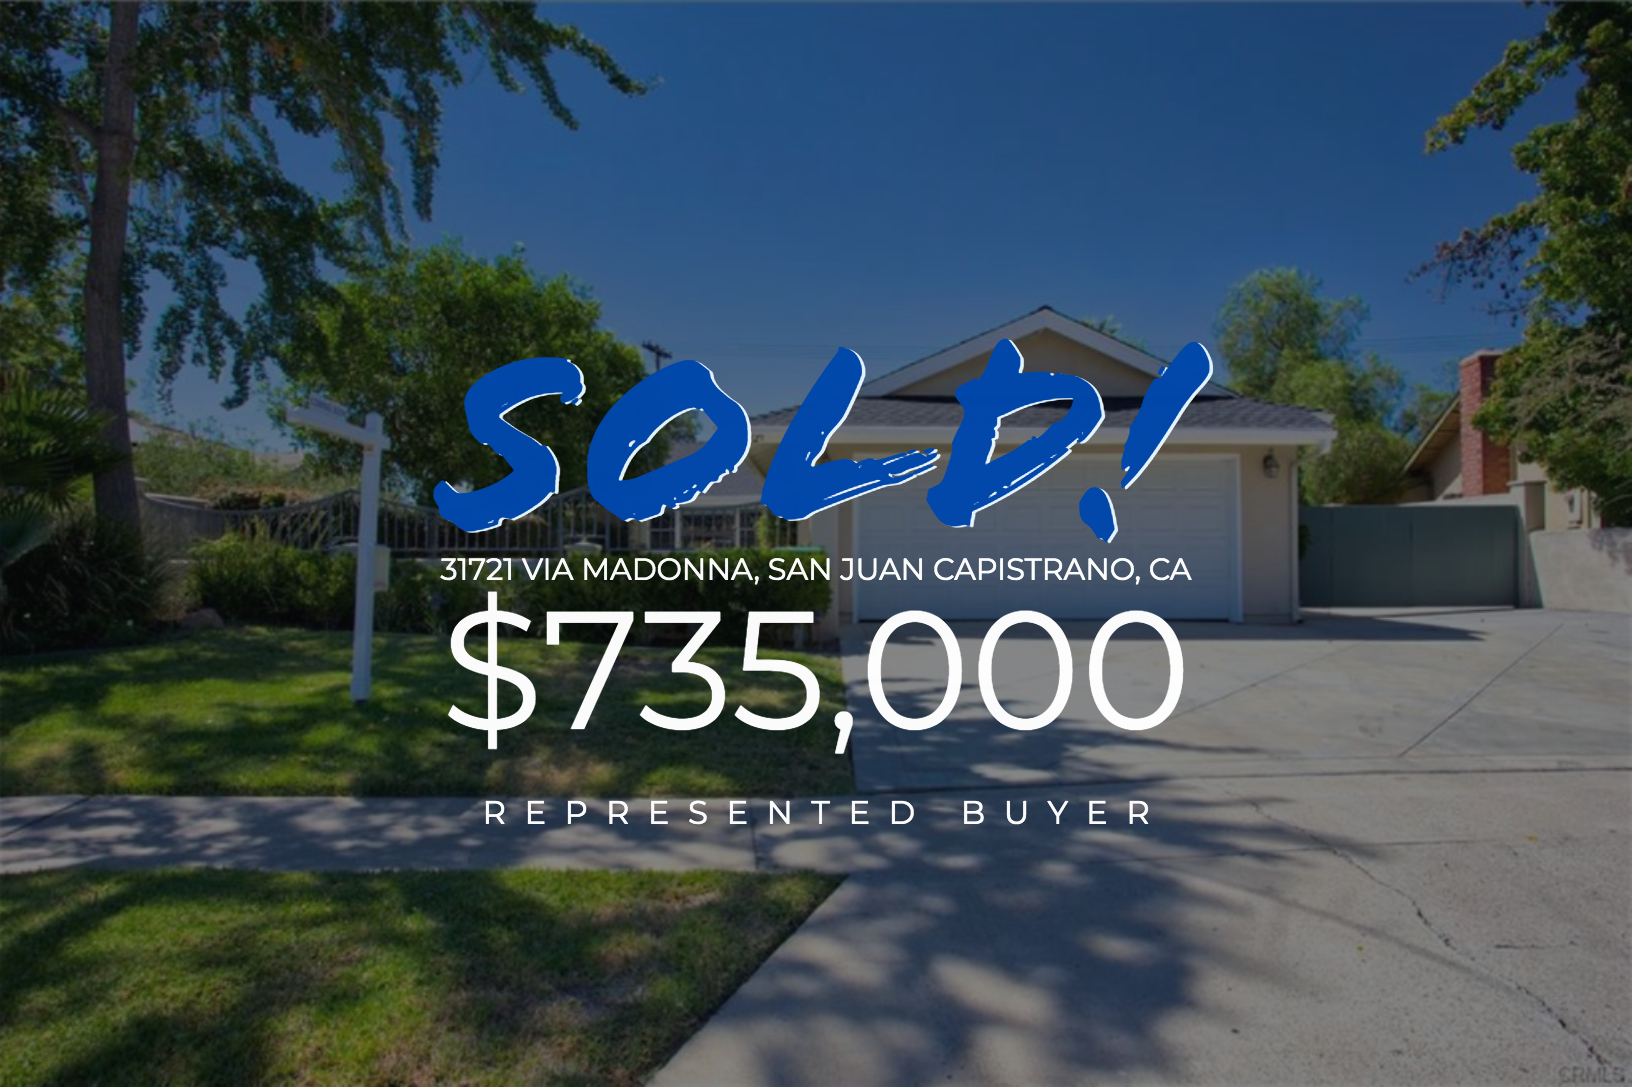 Sold With Matt Blashaw 31721 Via Madonna in San Juan Capistrano, CA